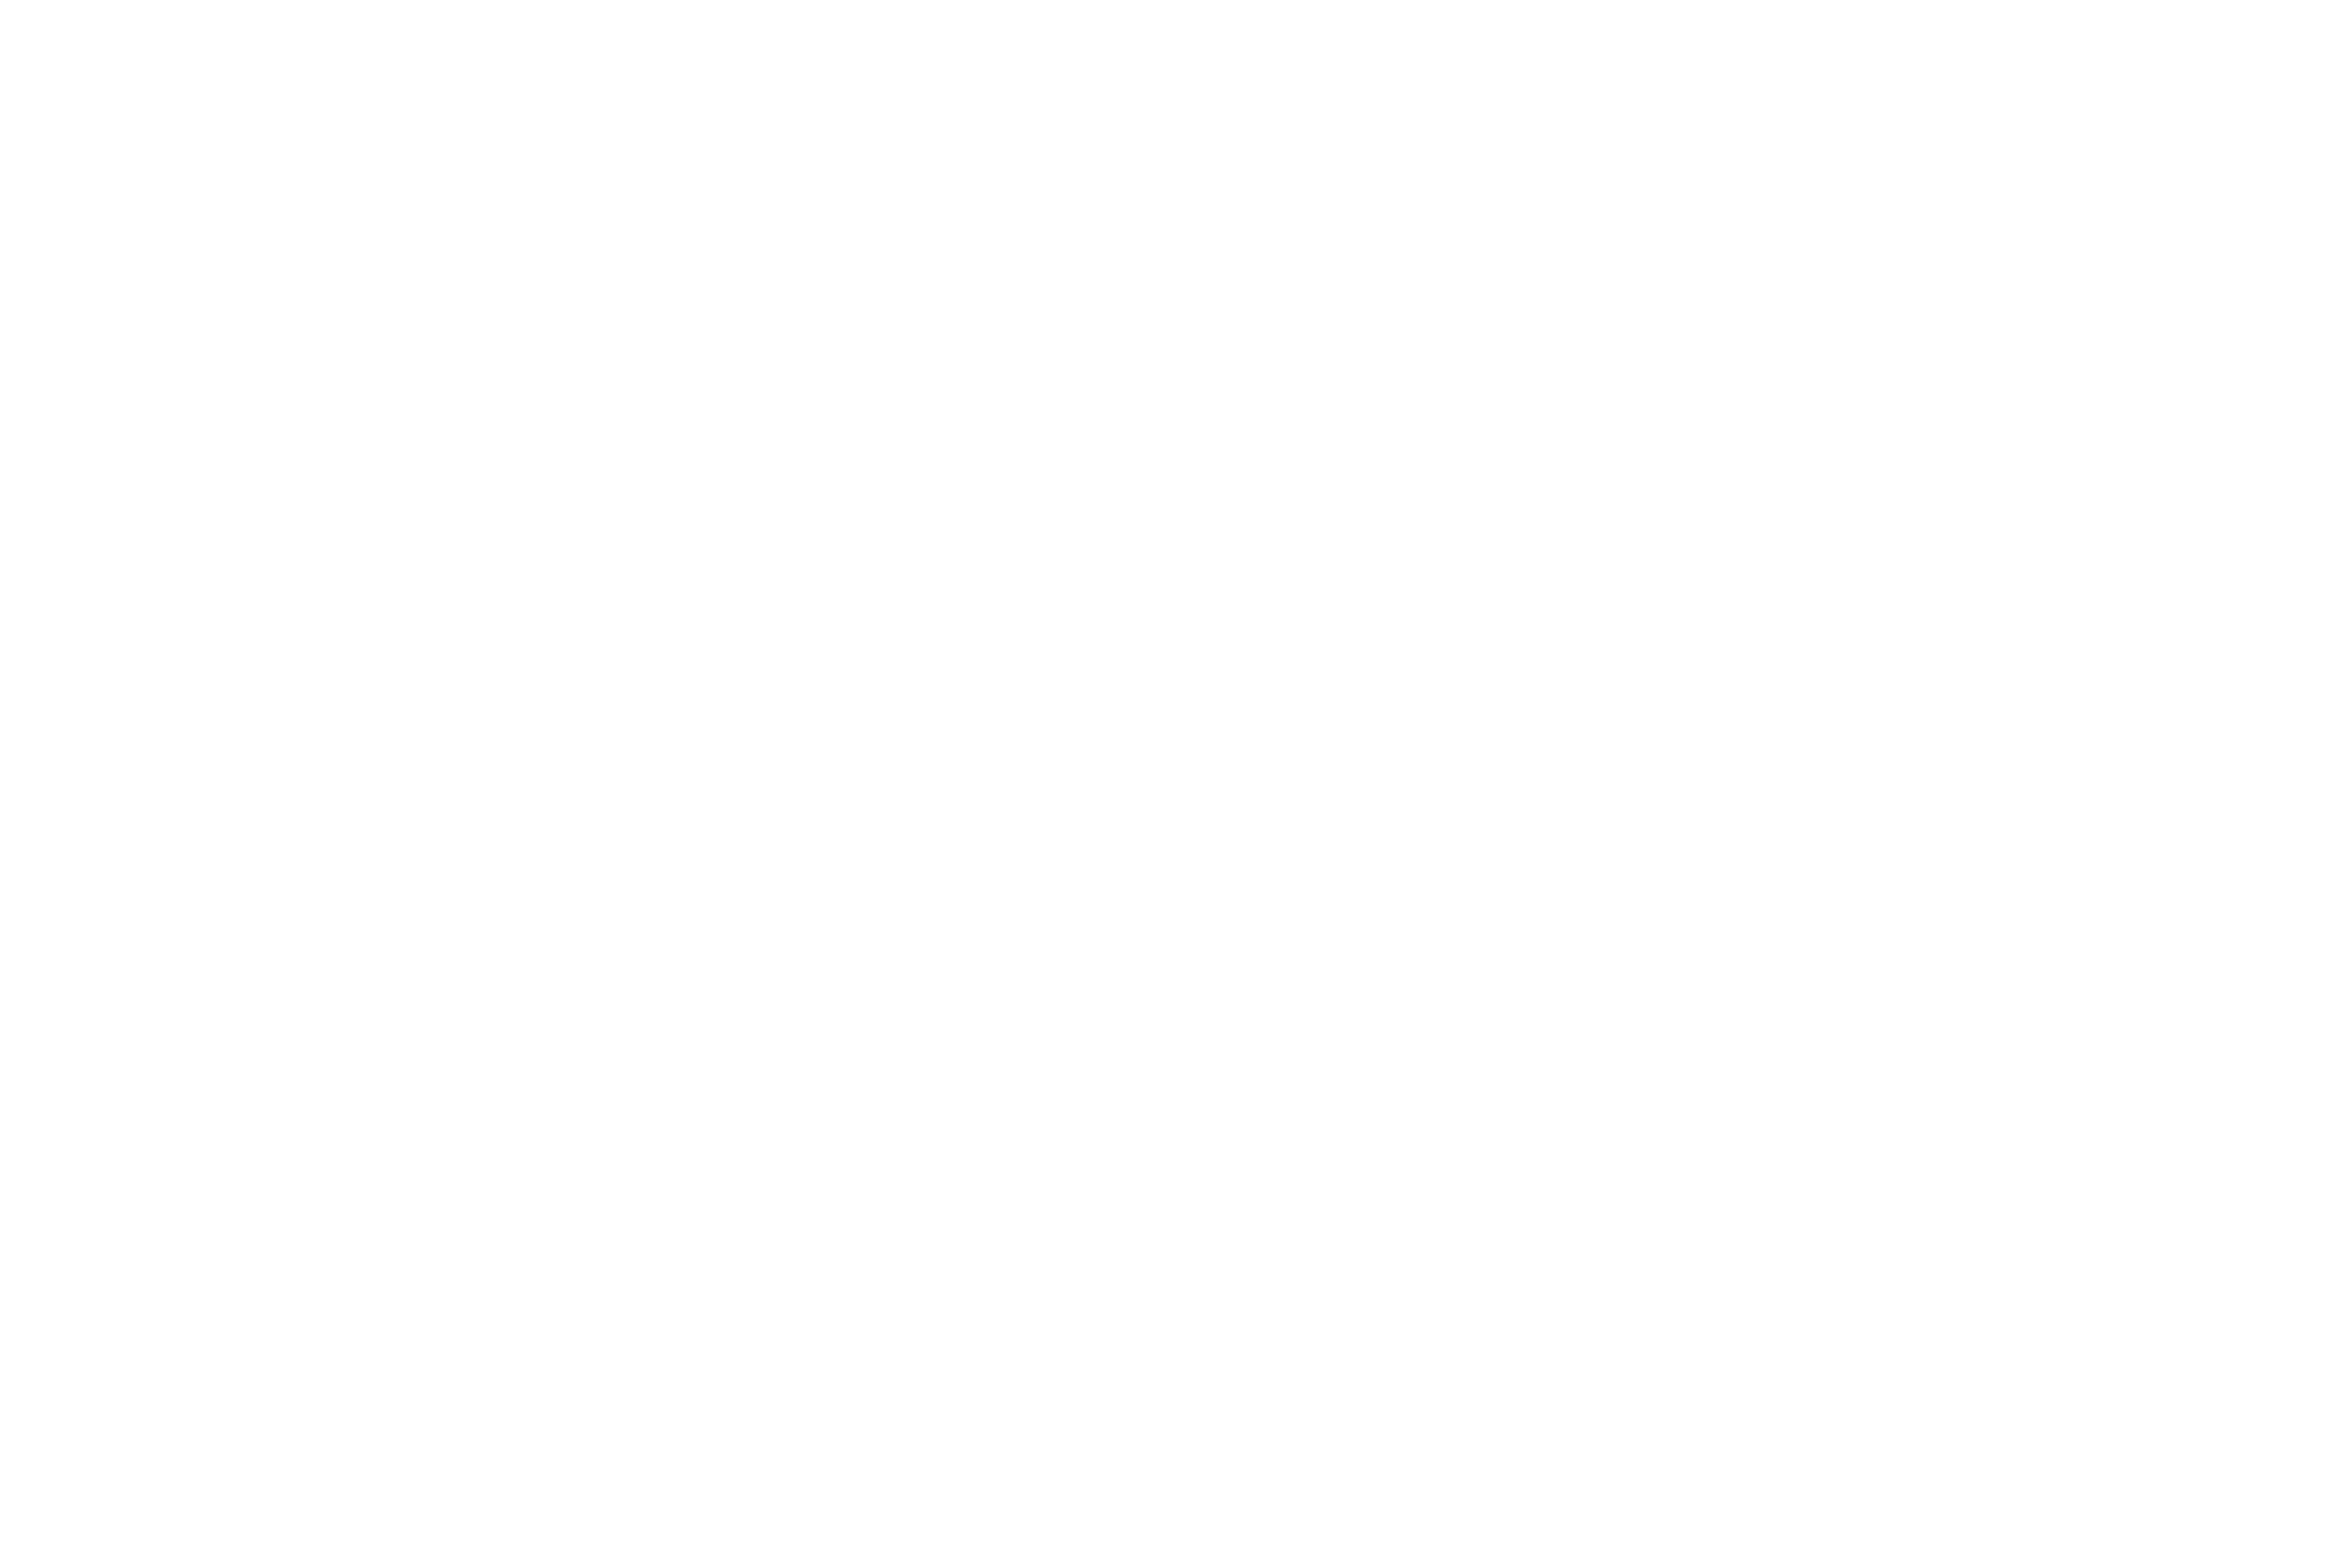 Vespa Legshield Badge – Vespa – 150 Sprint,Super,Rally (Curve)